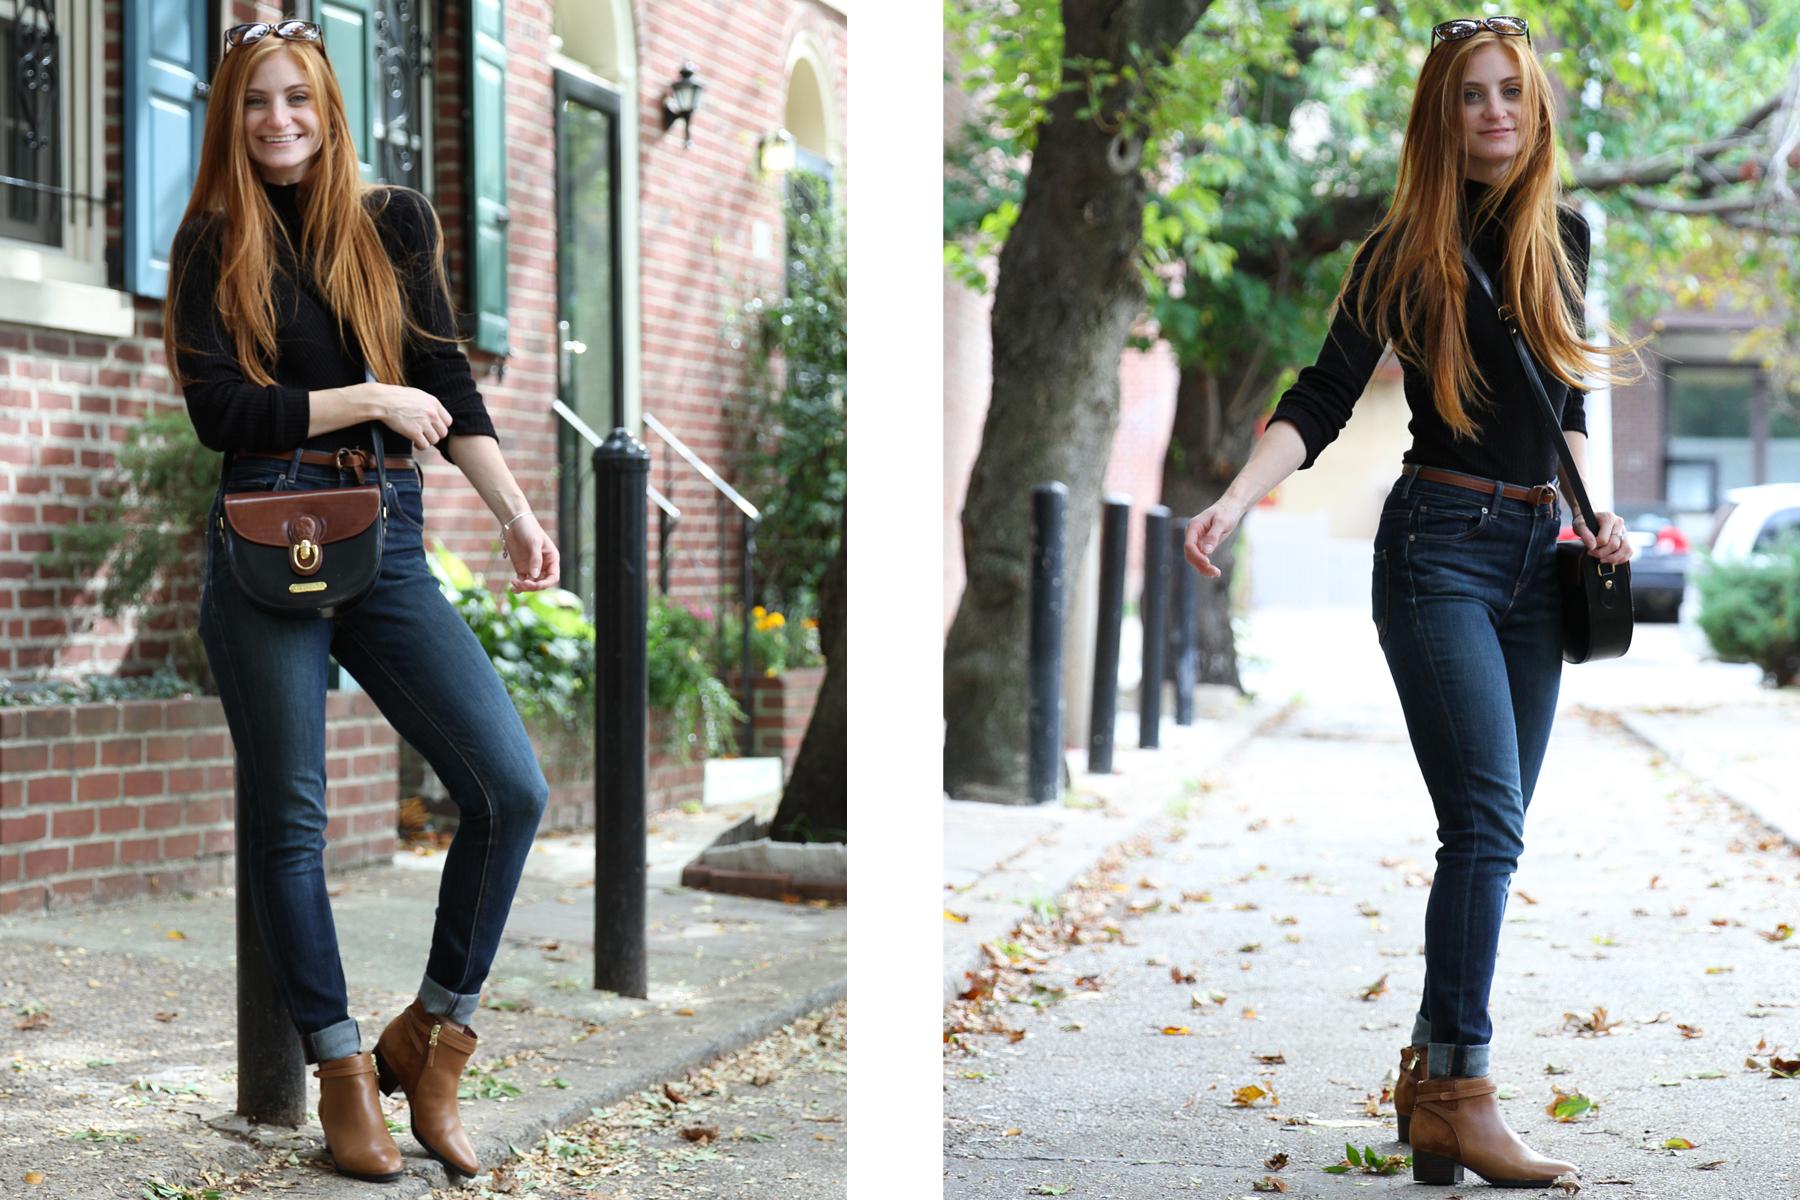 Redhead girl posing for photo on cobblestone road